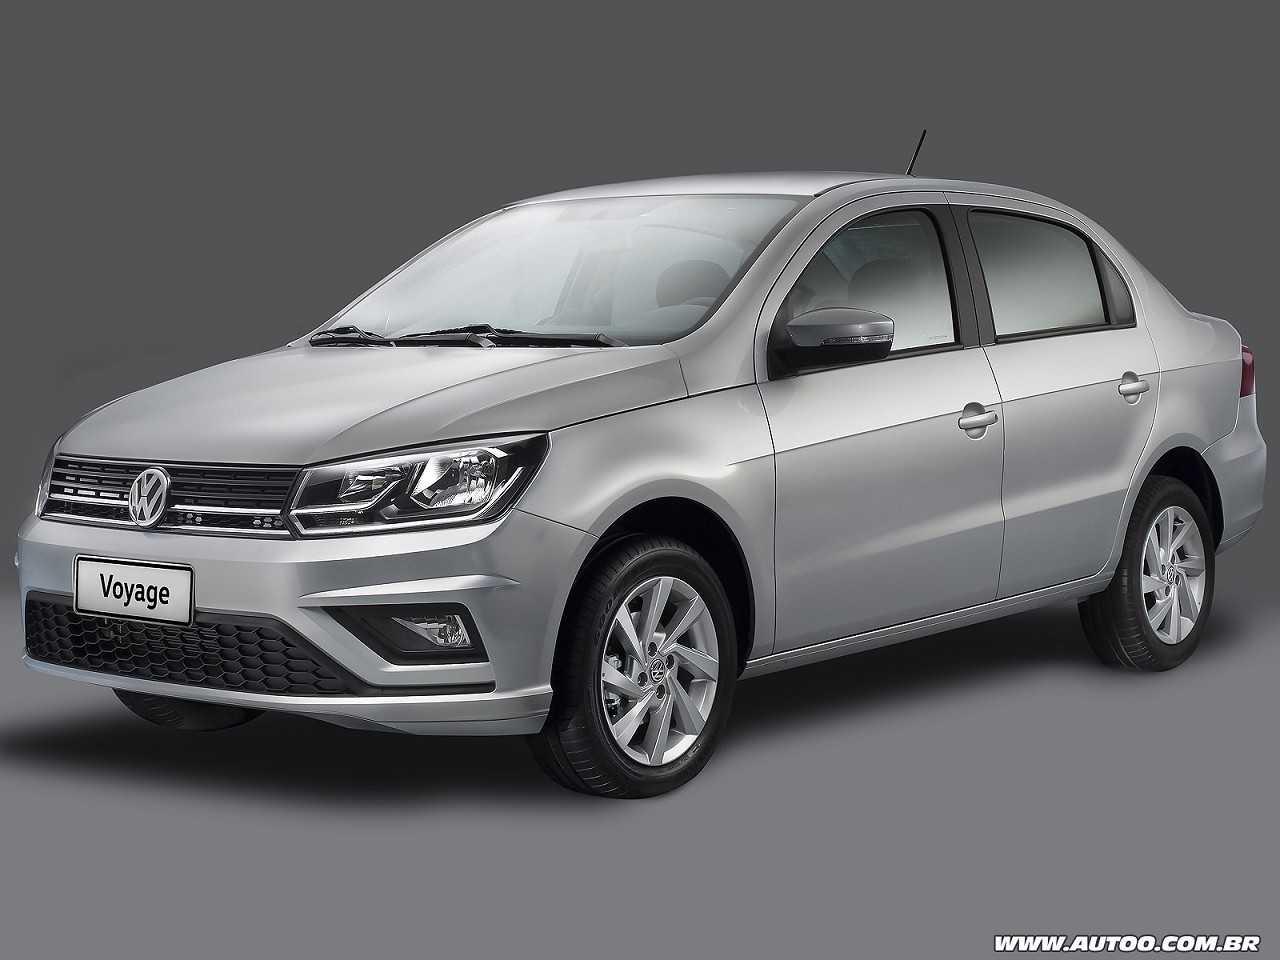 VolkswagenVoyage 2019 - ângulo frontal